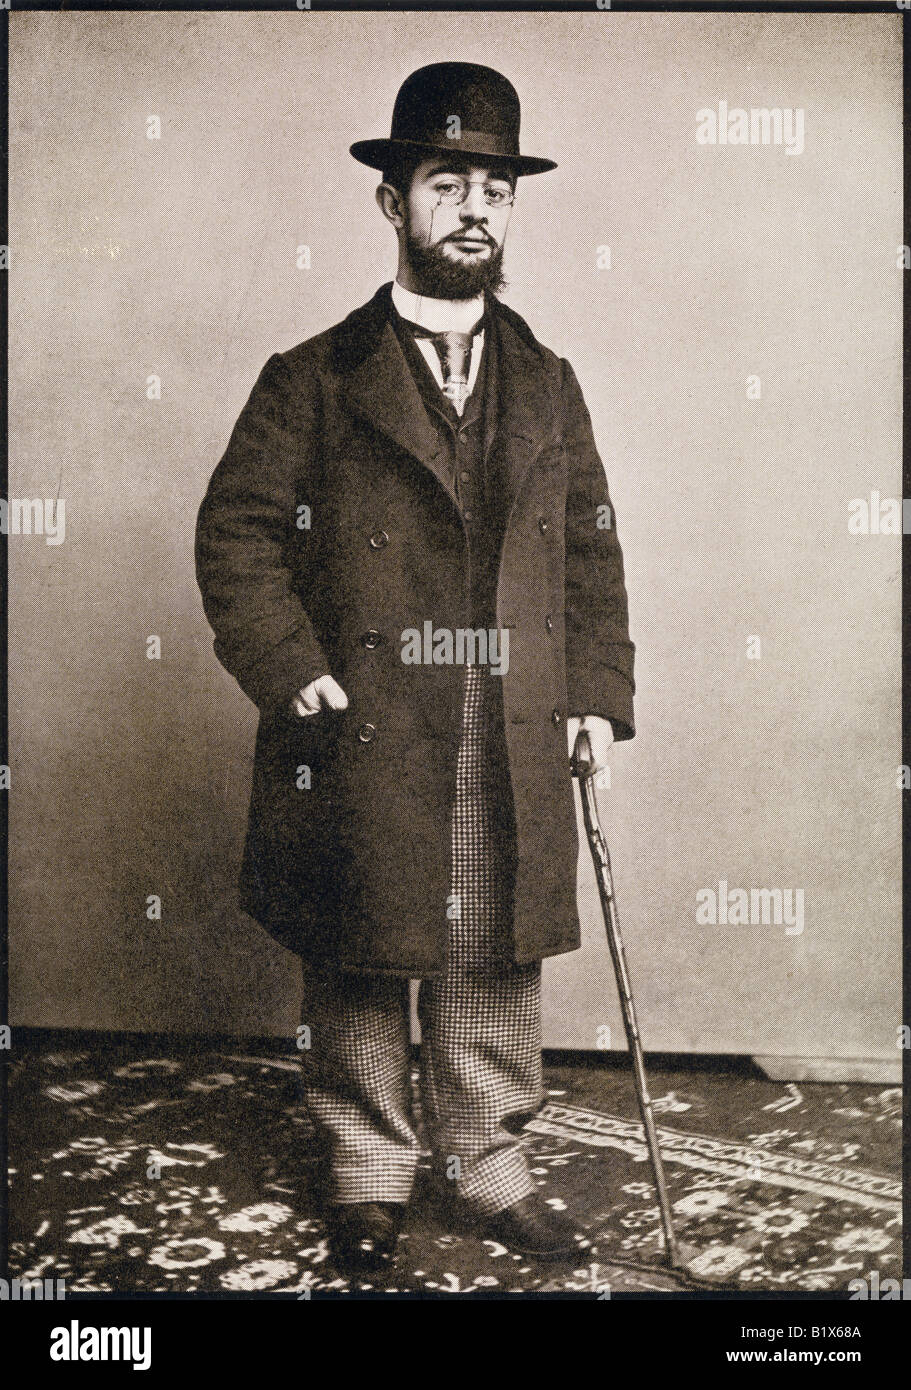 Henri Marie Raymond de Toulouse Lautrec Monfa, 1864 - 1901. French painter, printmaker, draftsman and illustrator.Stock Photo